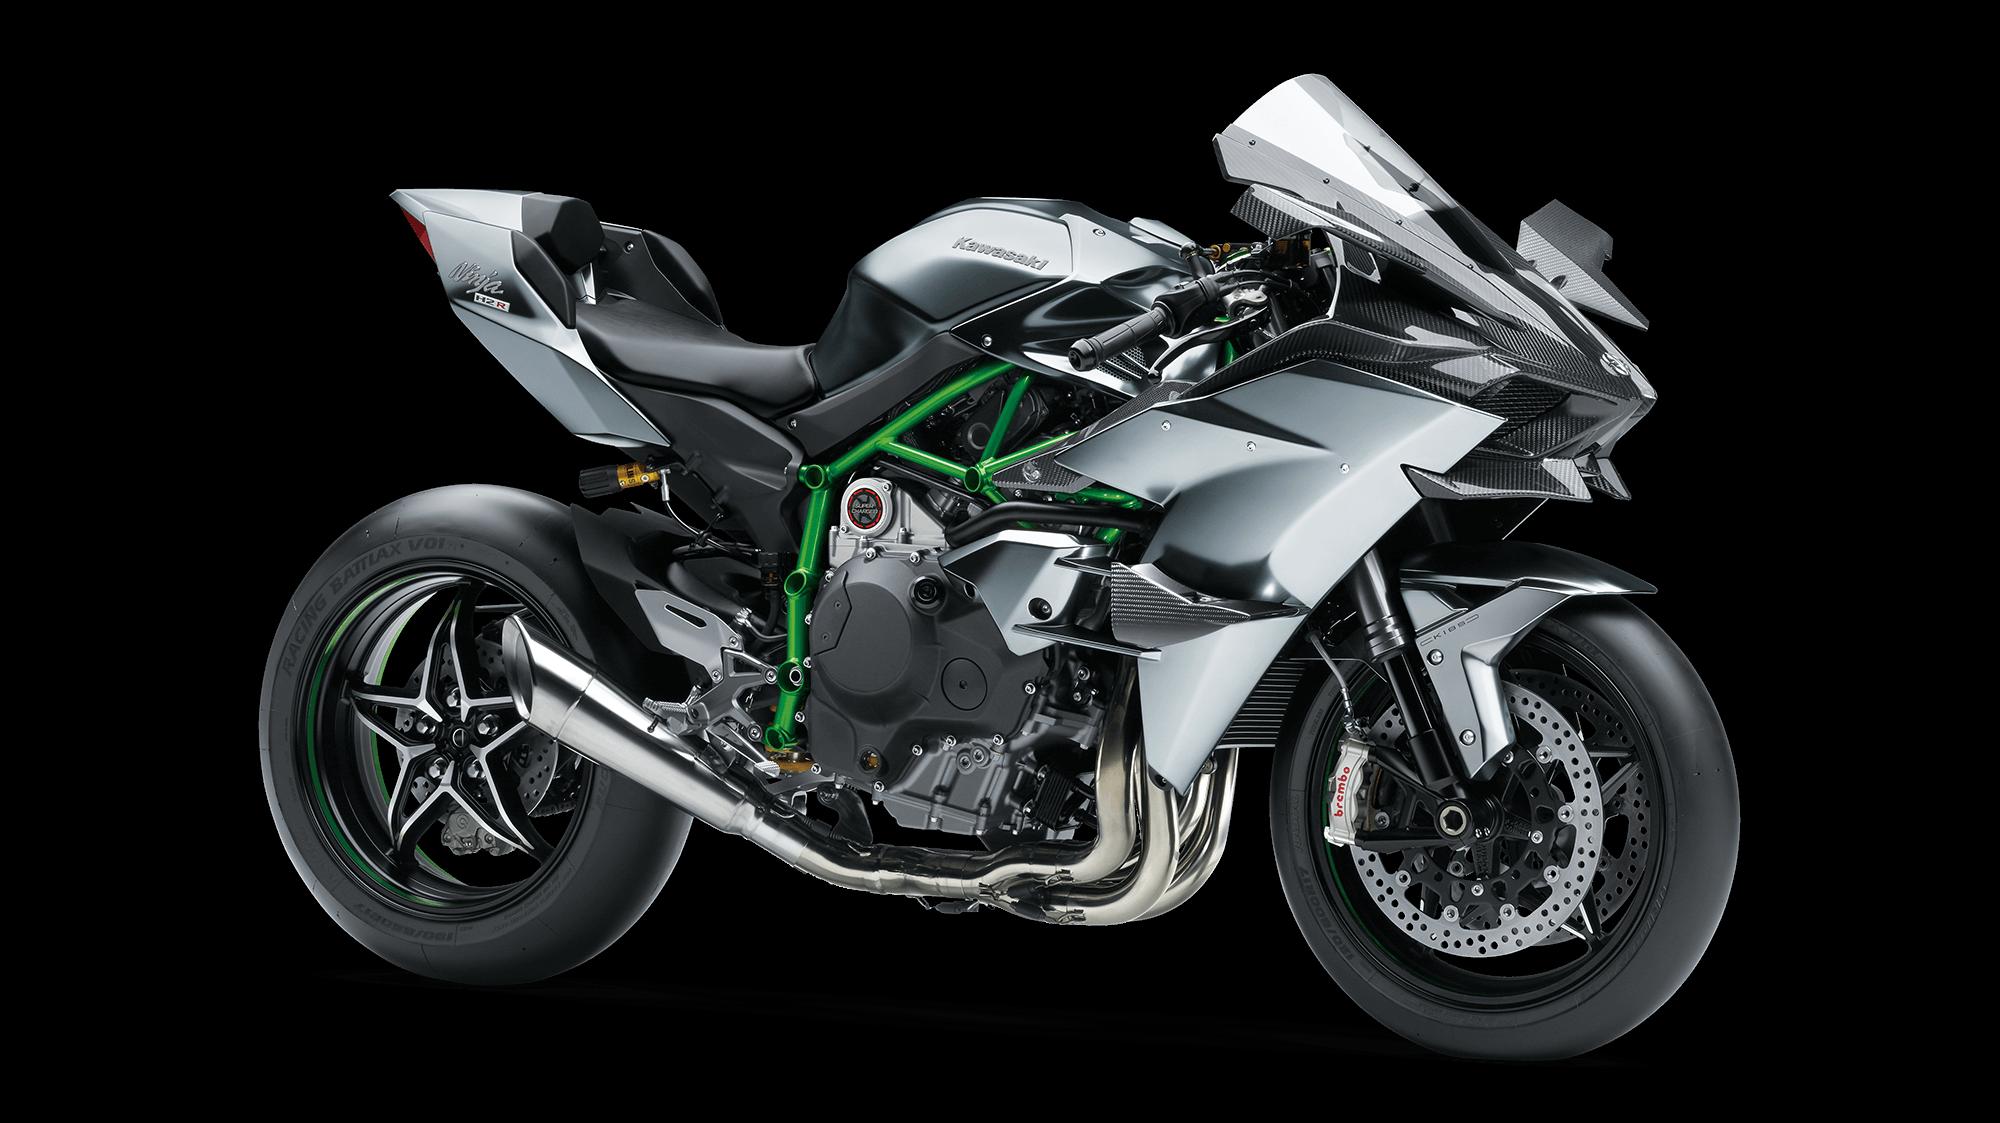 2019 Ninja H2r Ninja Motorcycle By Kawasaki